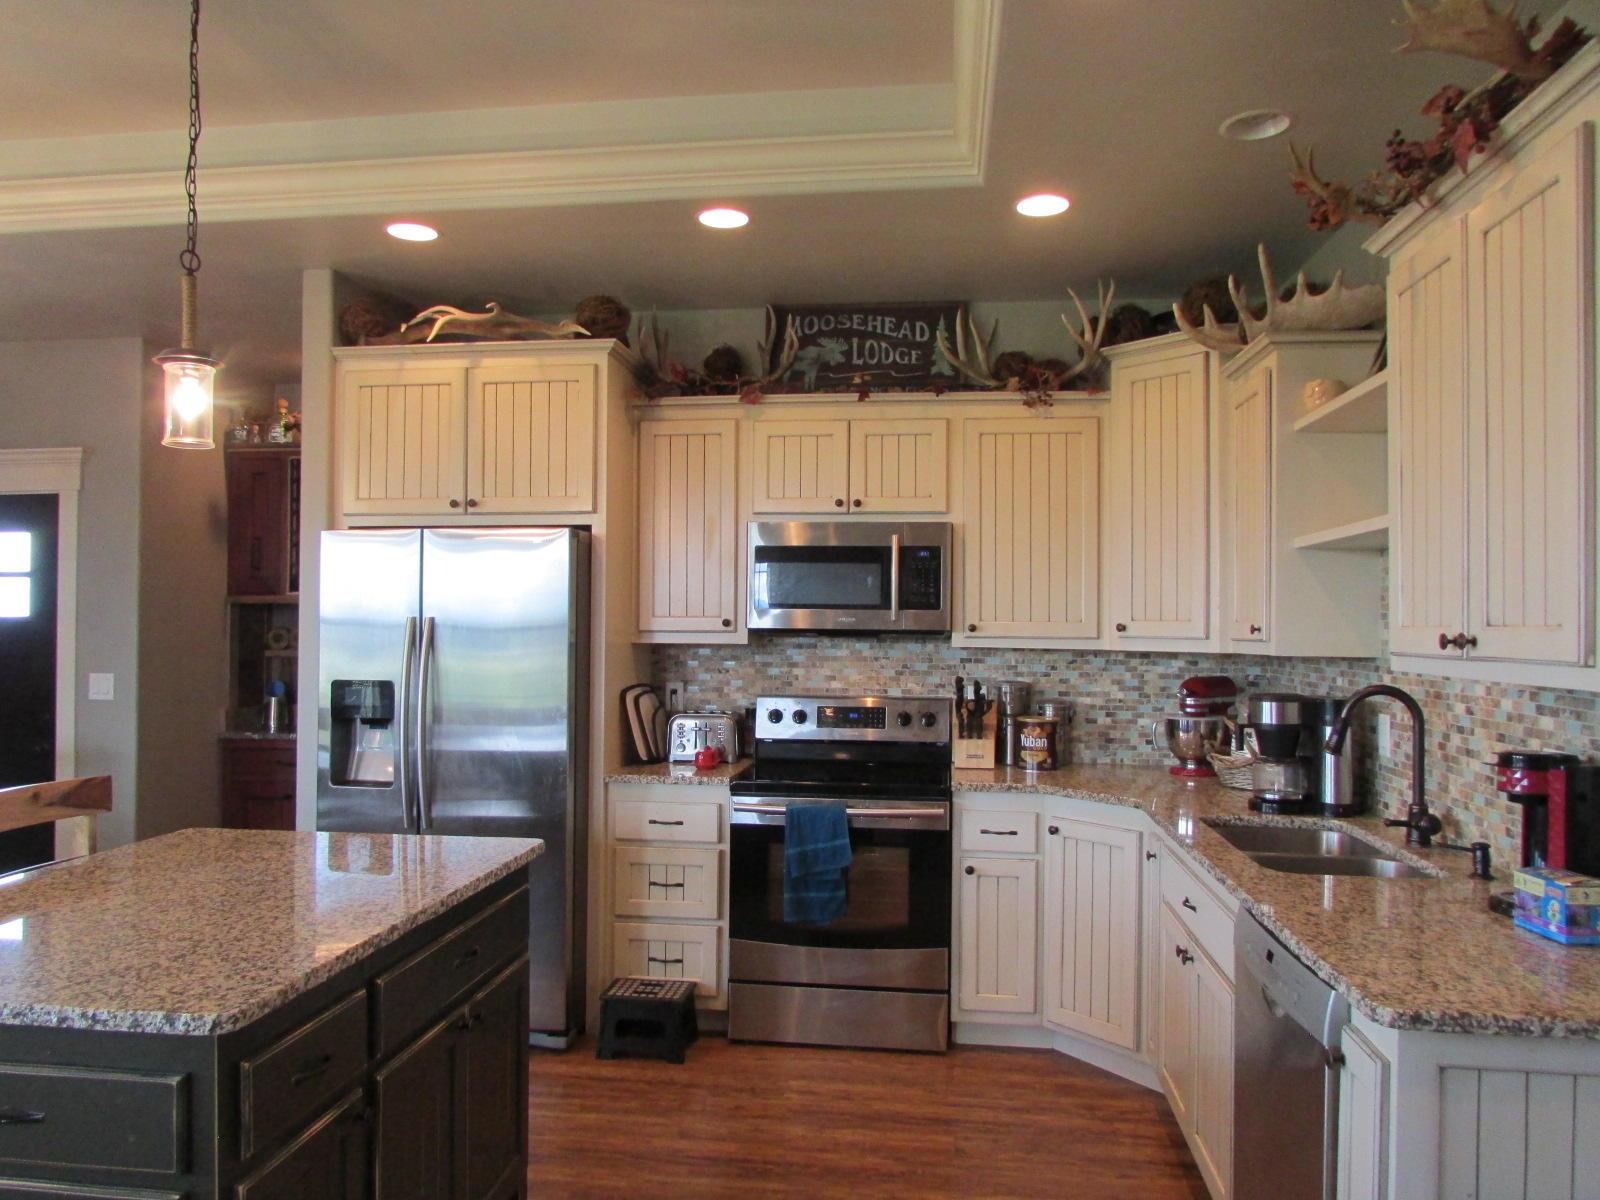 Quartz counters & island, tile backsplash, wood laminate flooring, stainless steel appliances, tray ceiling